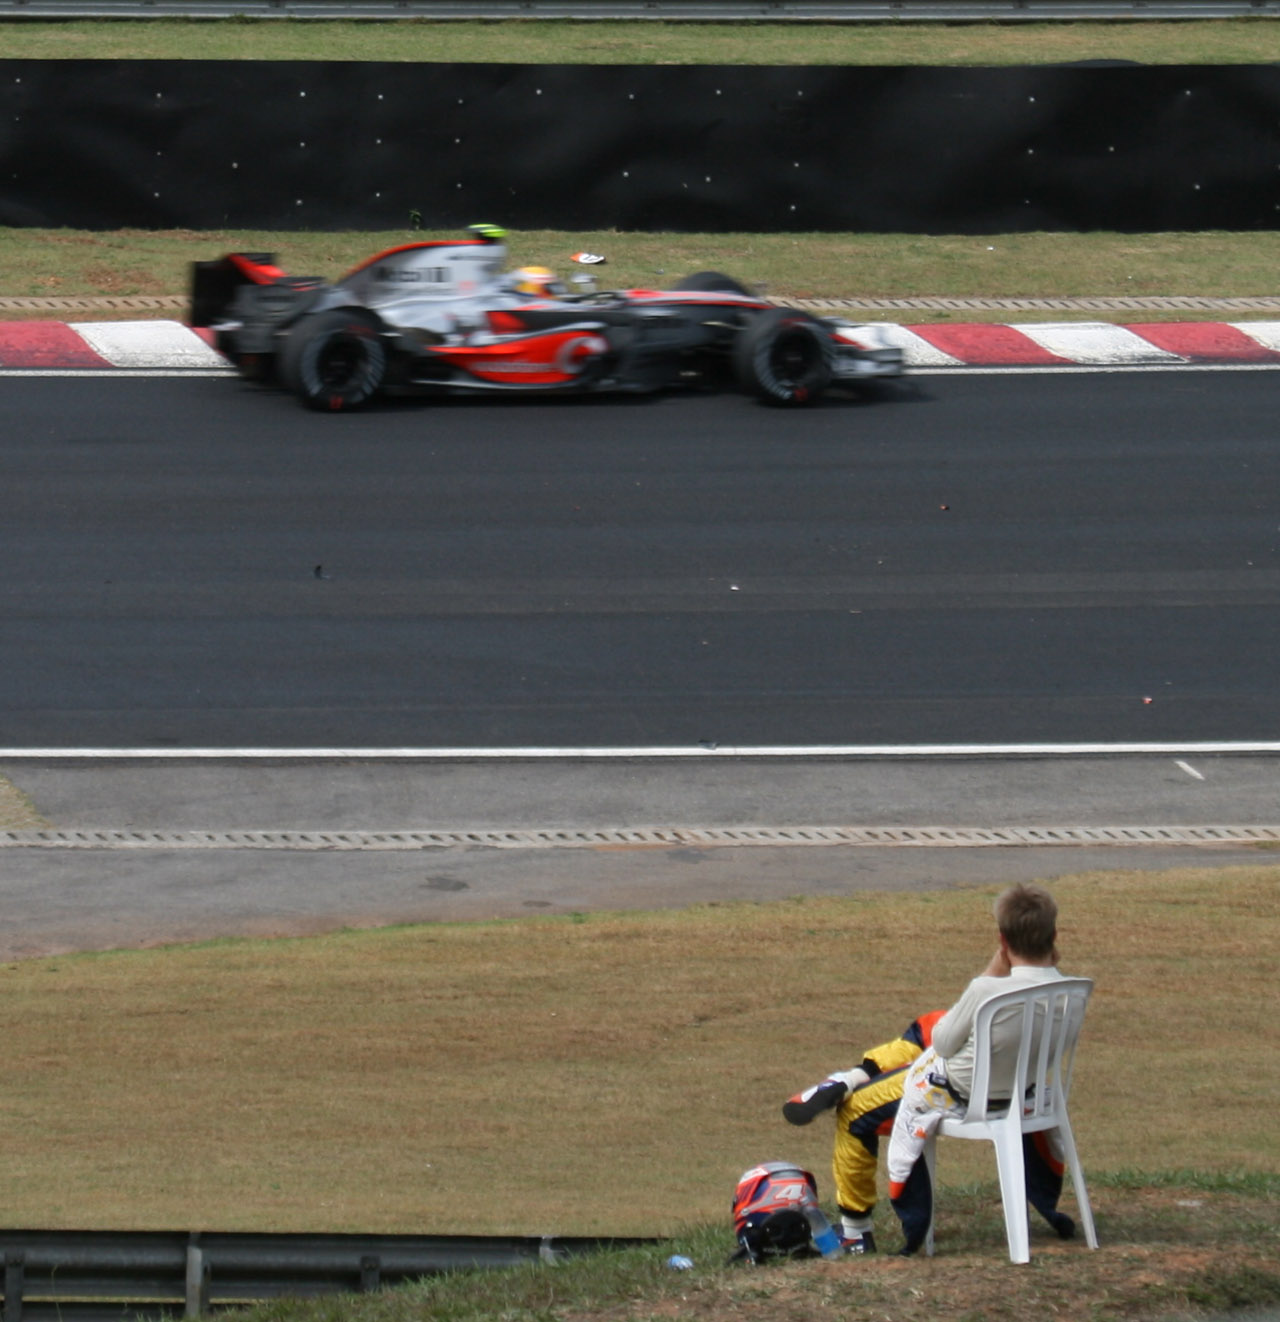 F1 grand prix brazil online dating